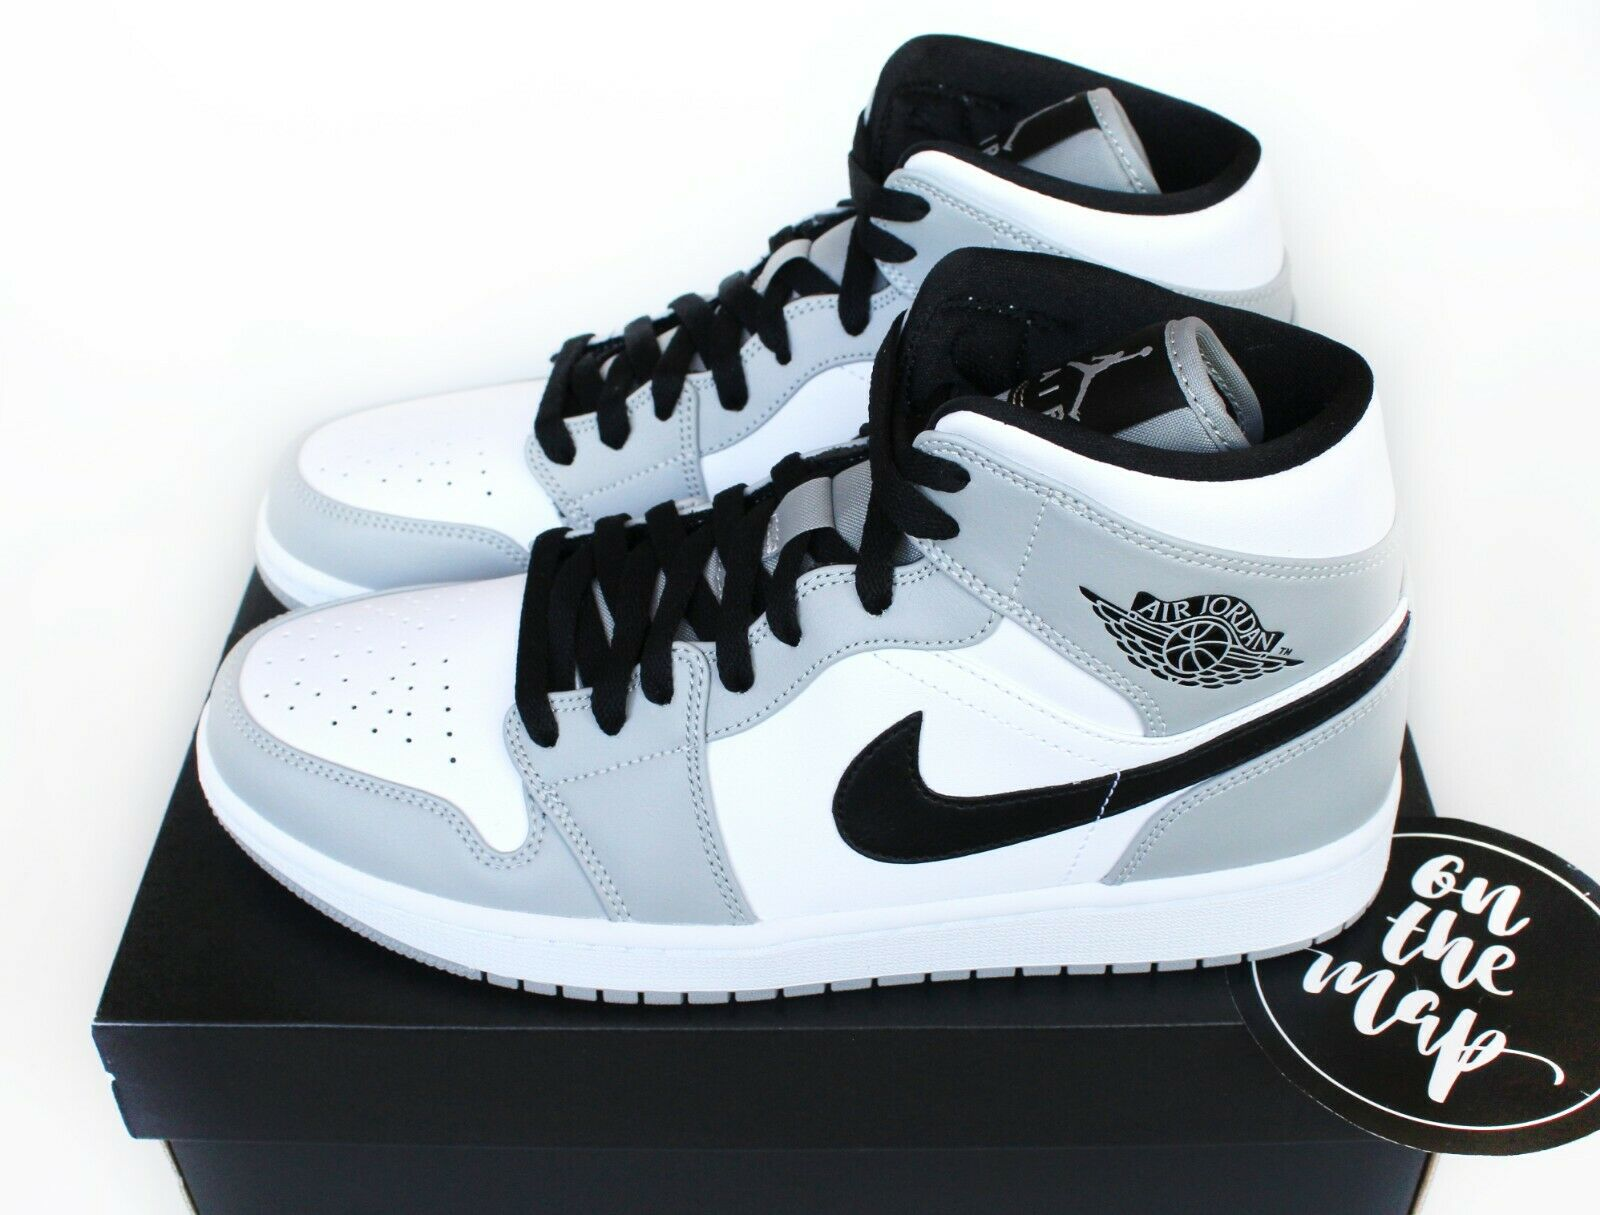 Nike Air Jordan 1 Retro Mid Smoke Grey